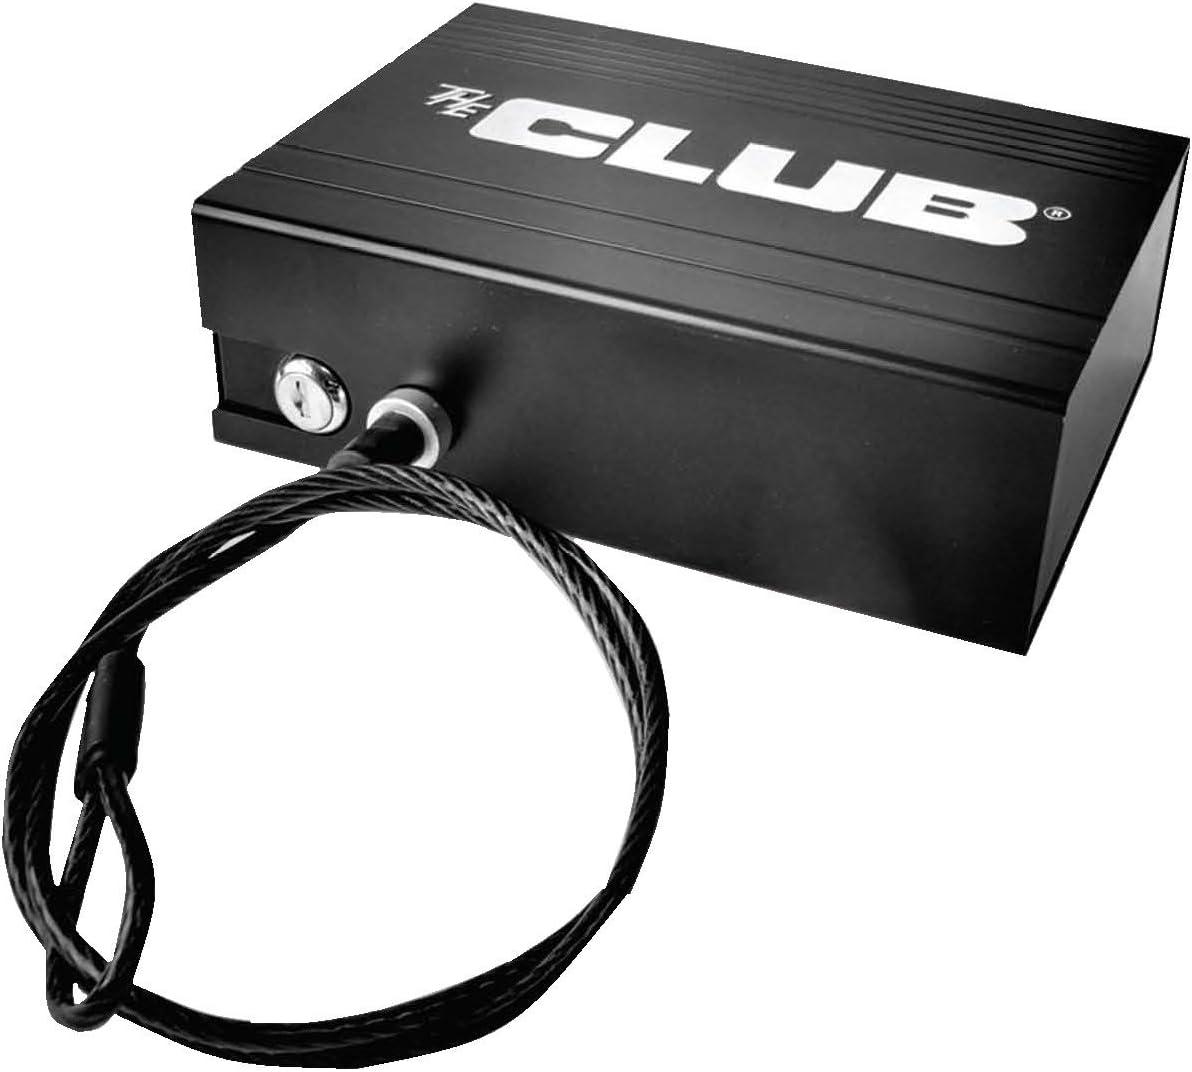 B002WRRNFO The Club LB200 Personal Vault Security Lock Box, Original 61muO-4h9bL